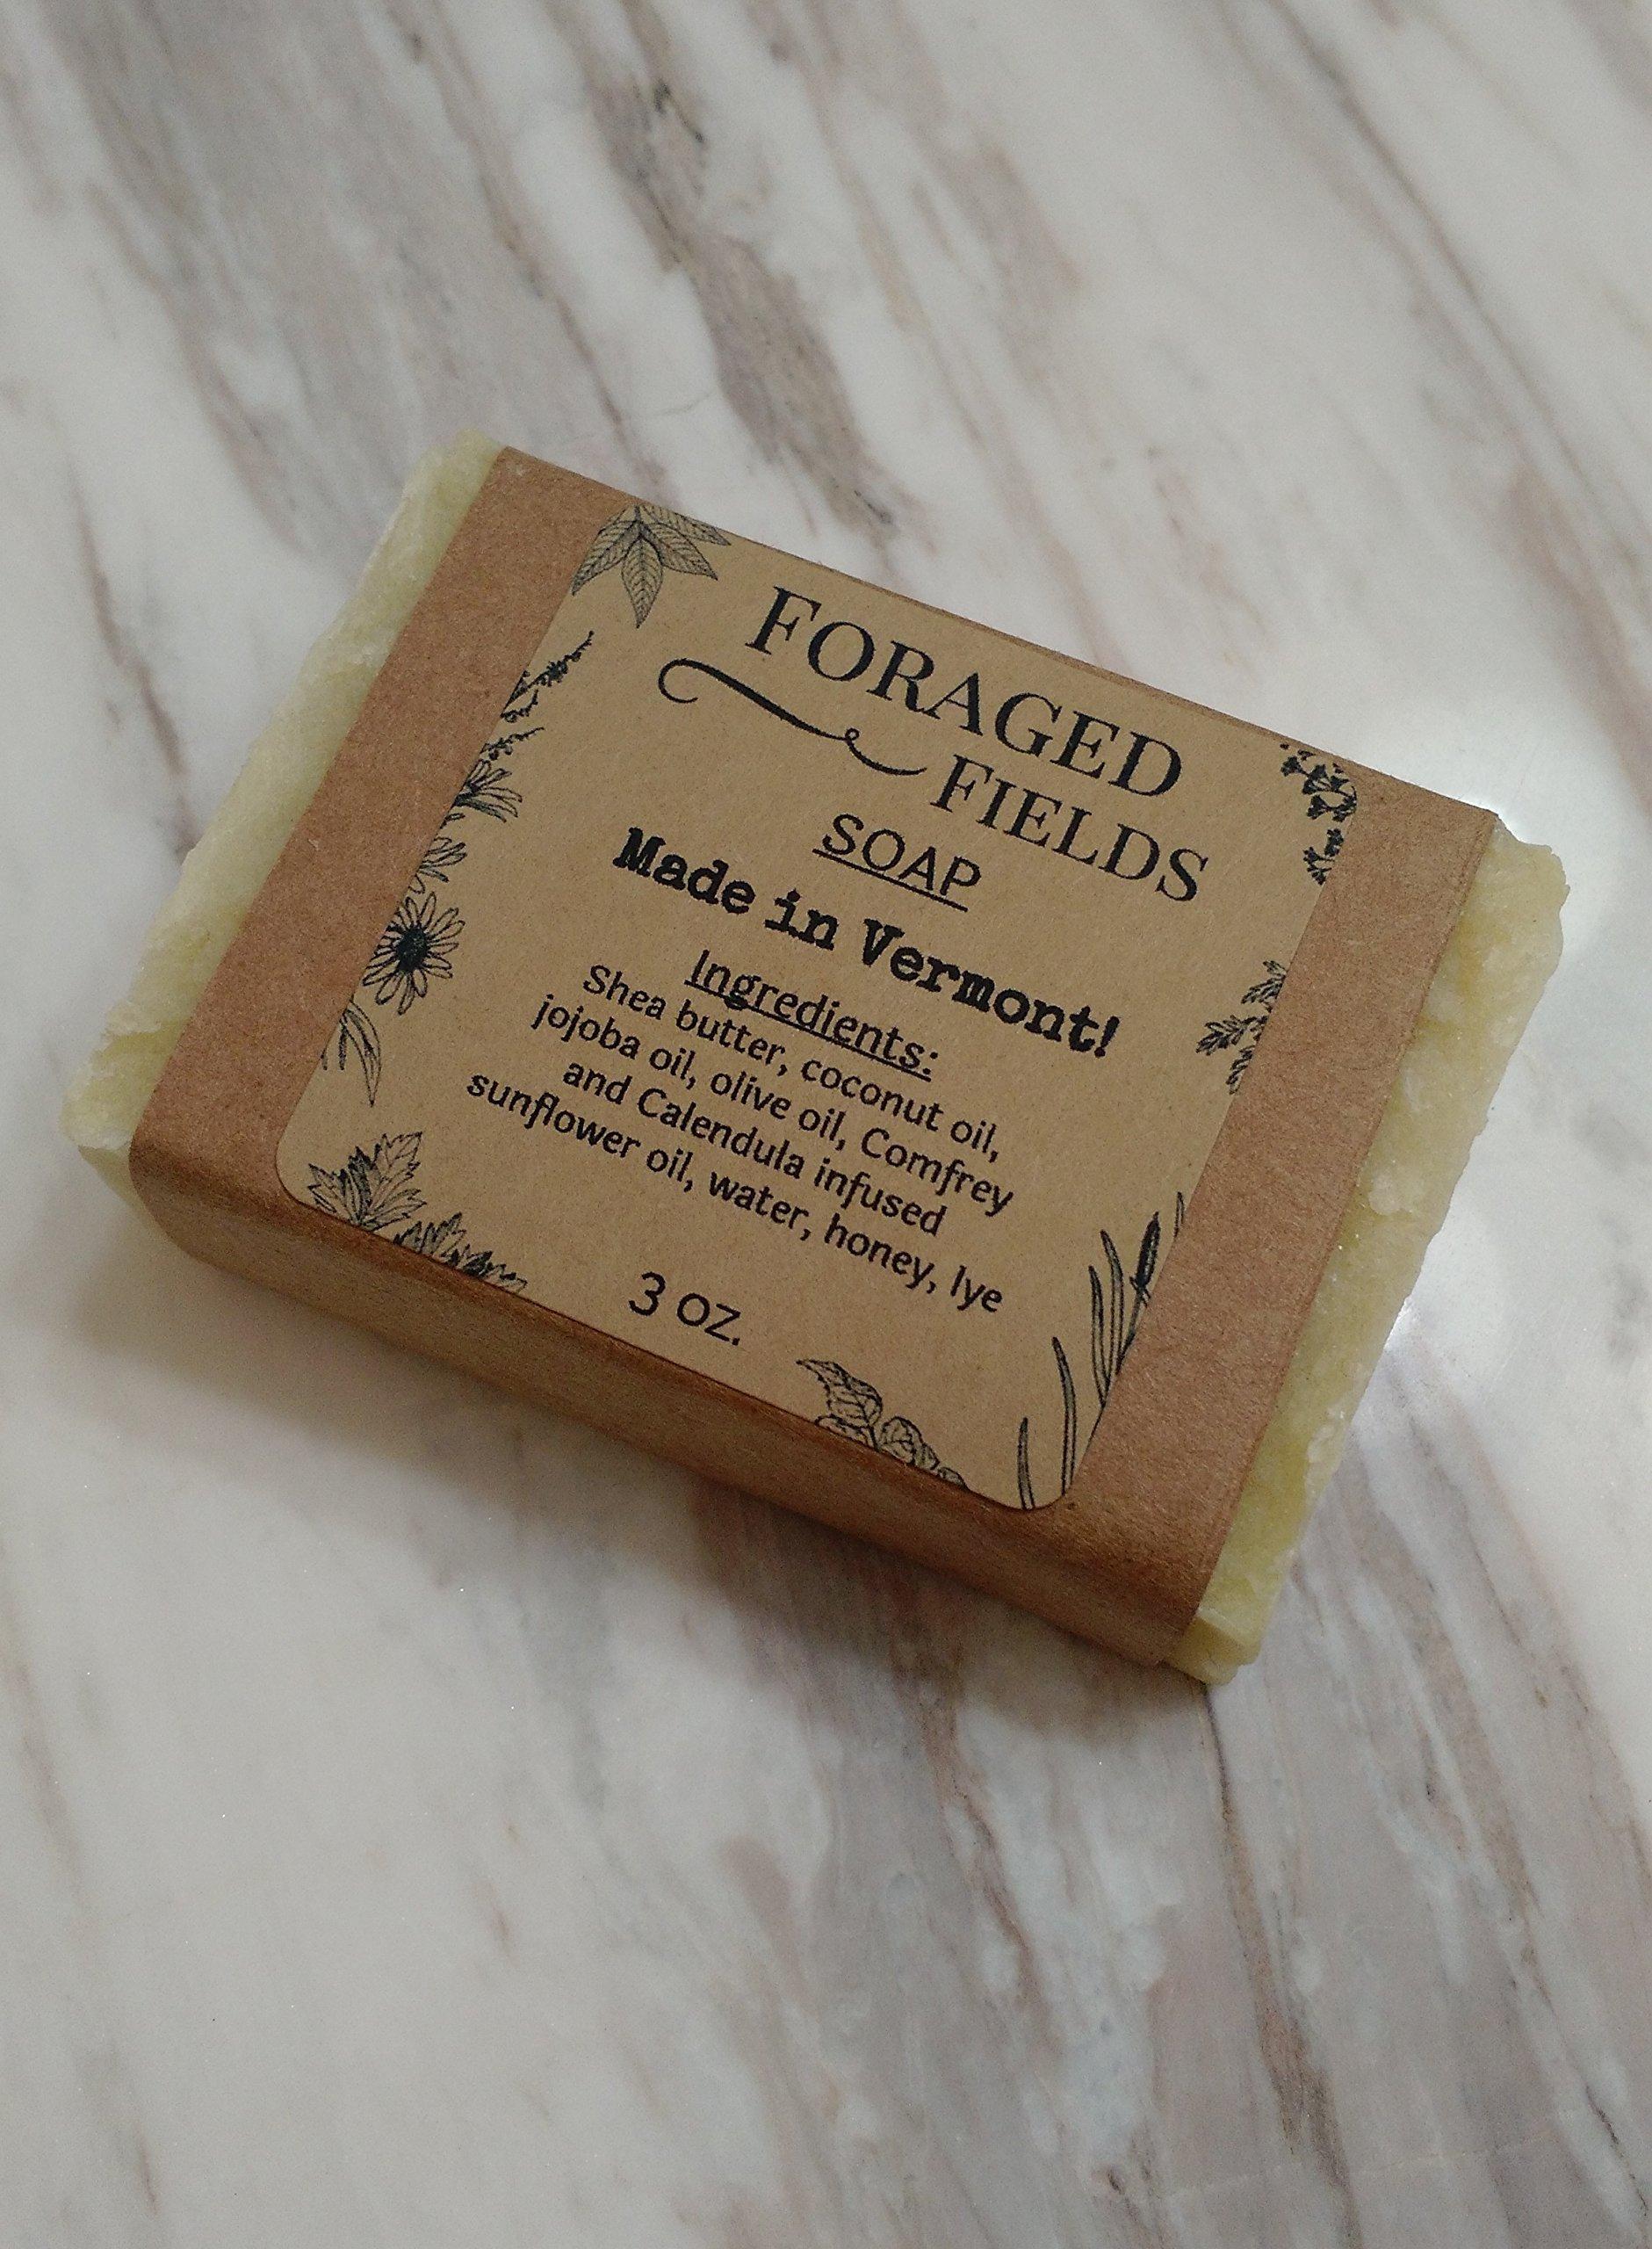 Unscented Hot Process Natural Soap with Calendula and Comfrey